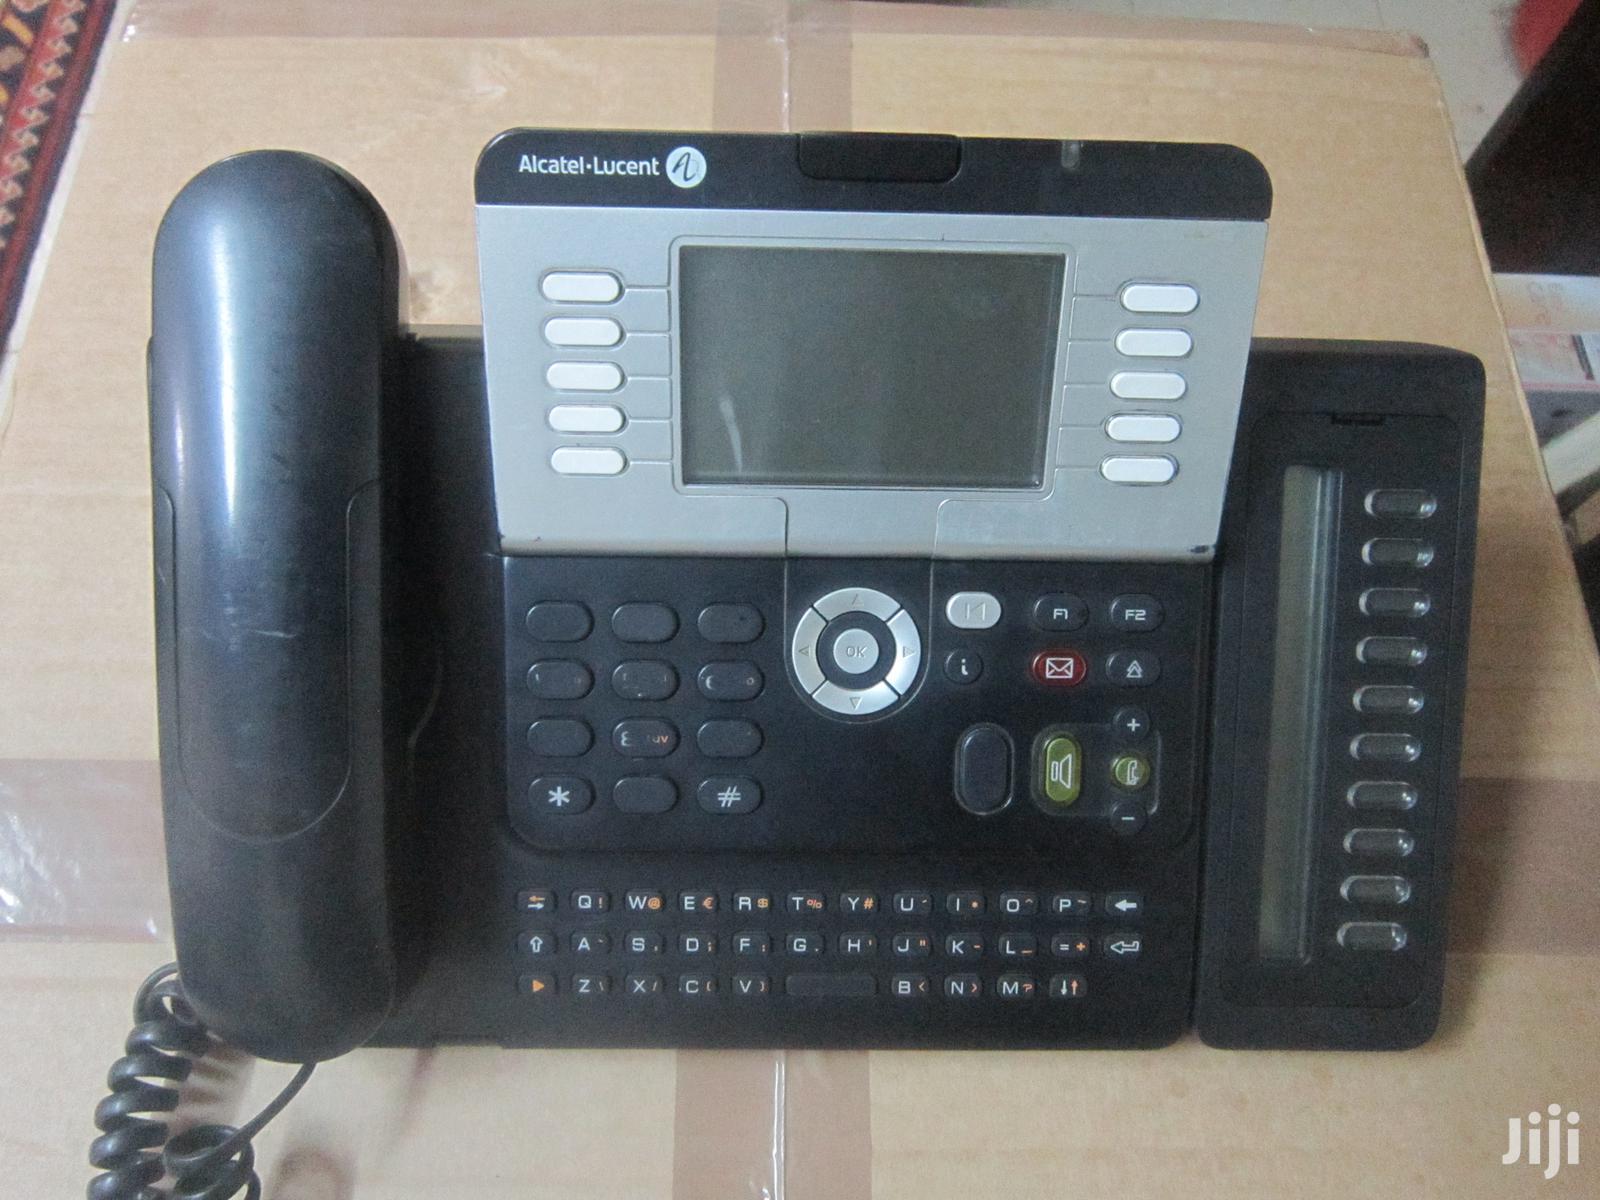 Archive: Alcatel 4039 Phone With 10-keys Module